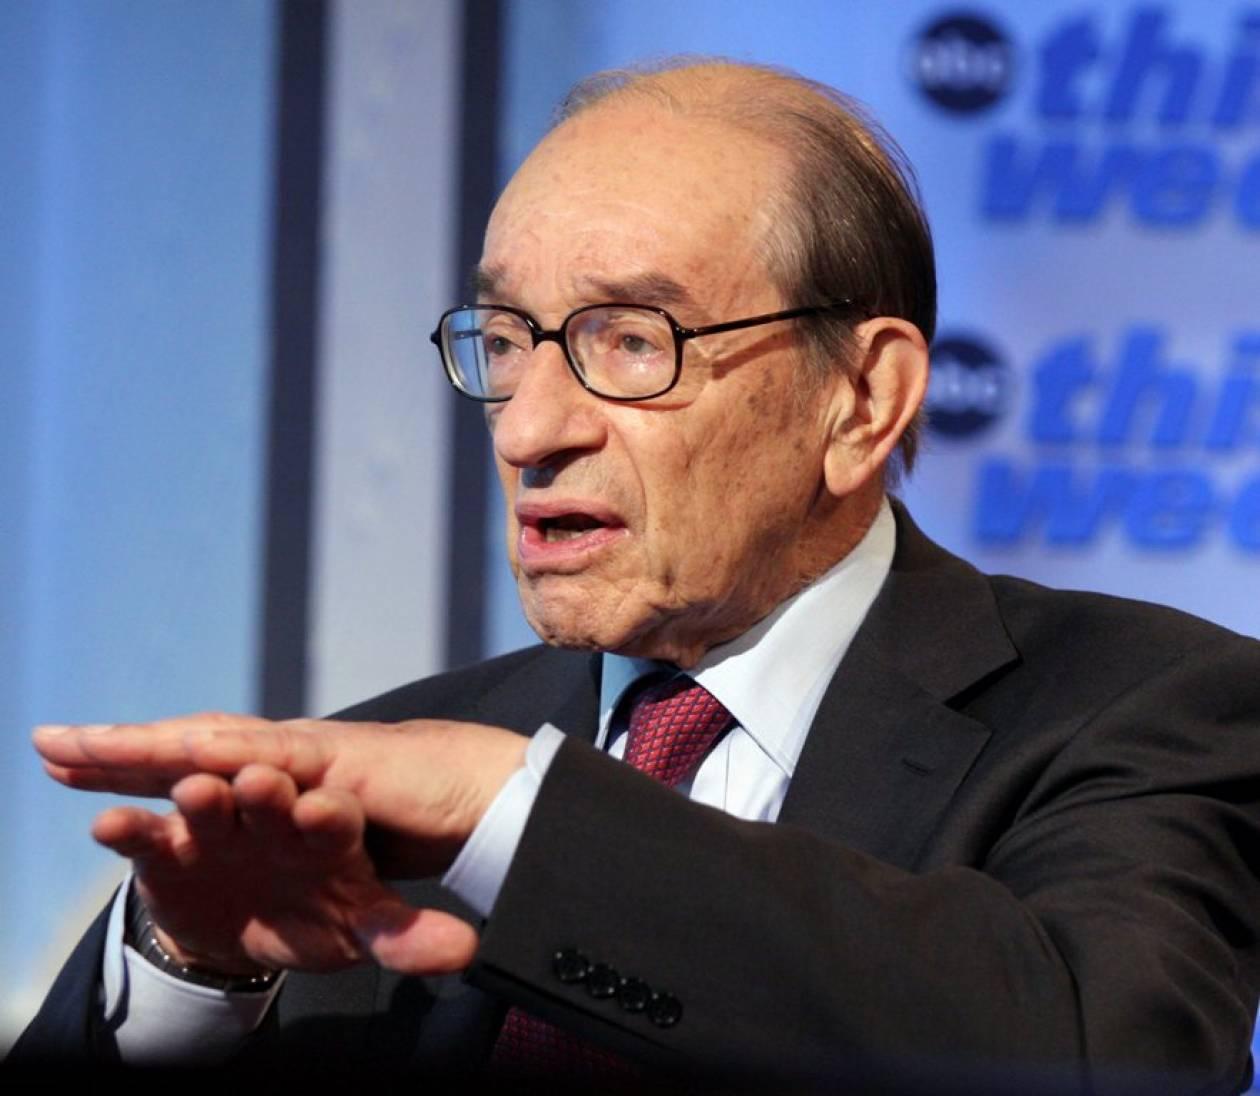 Alan Greenspan: Ήρωας ο Παπανδρέου